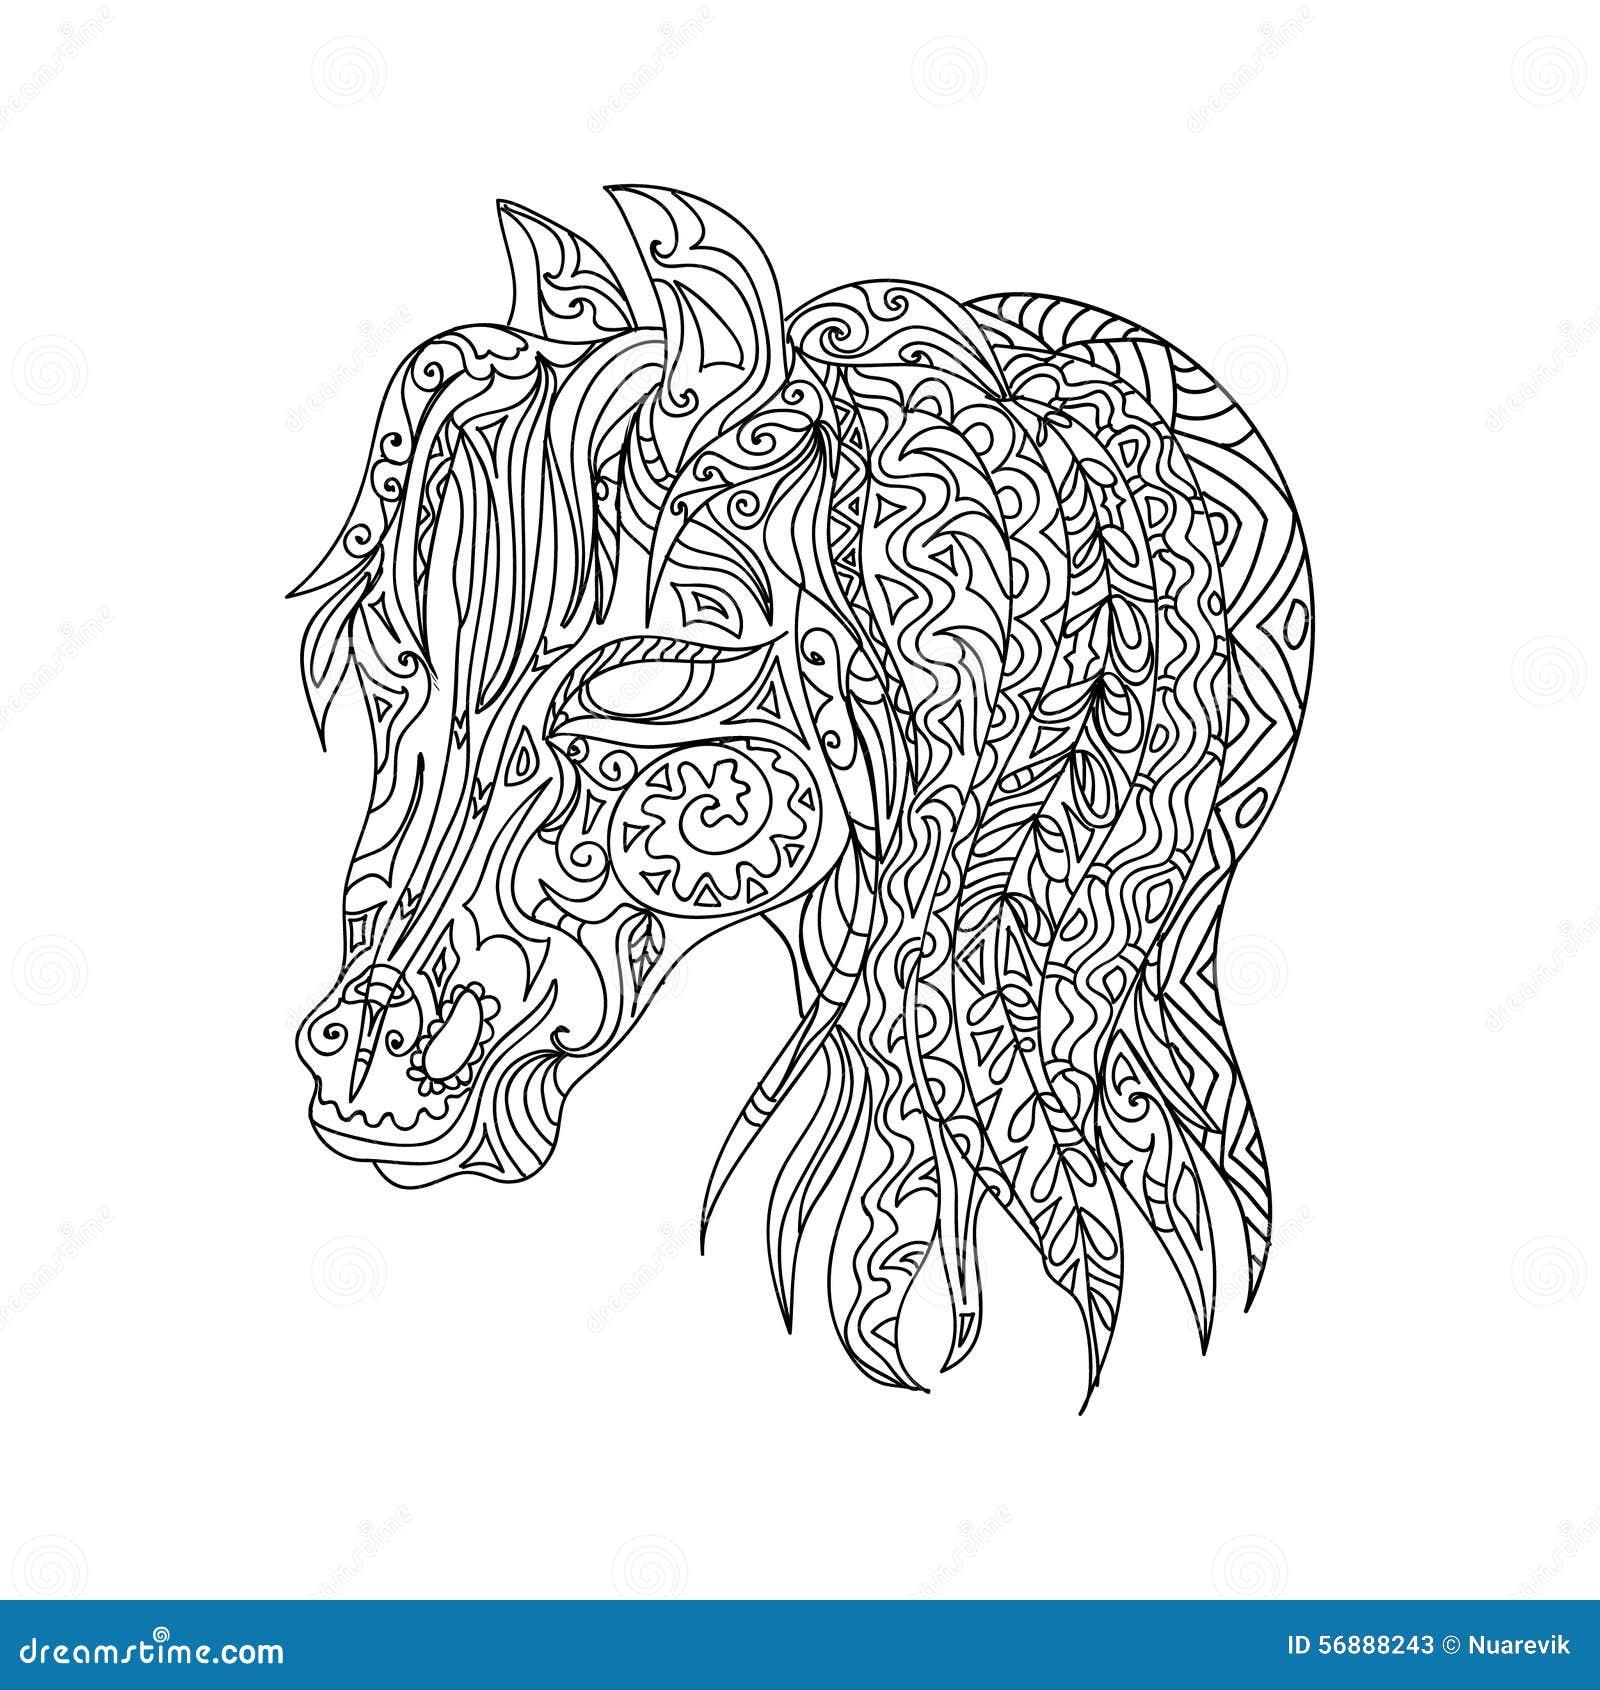 Kleurplaten Paarden En Pony S En Veulens Zentangle F 246 R H 228 Sthuvud Stock Illustrationer Illustration